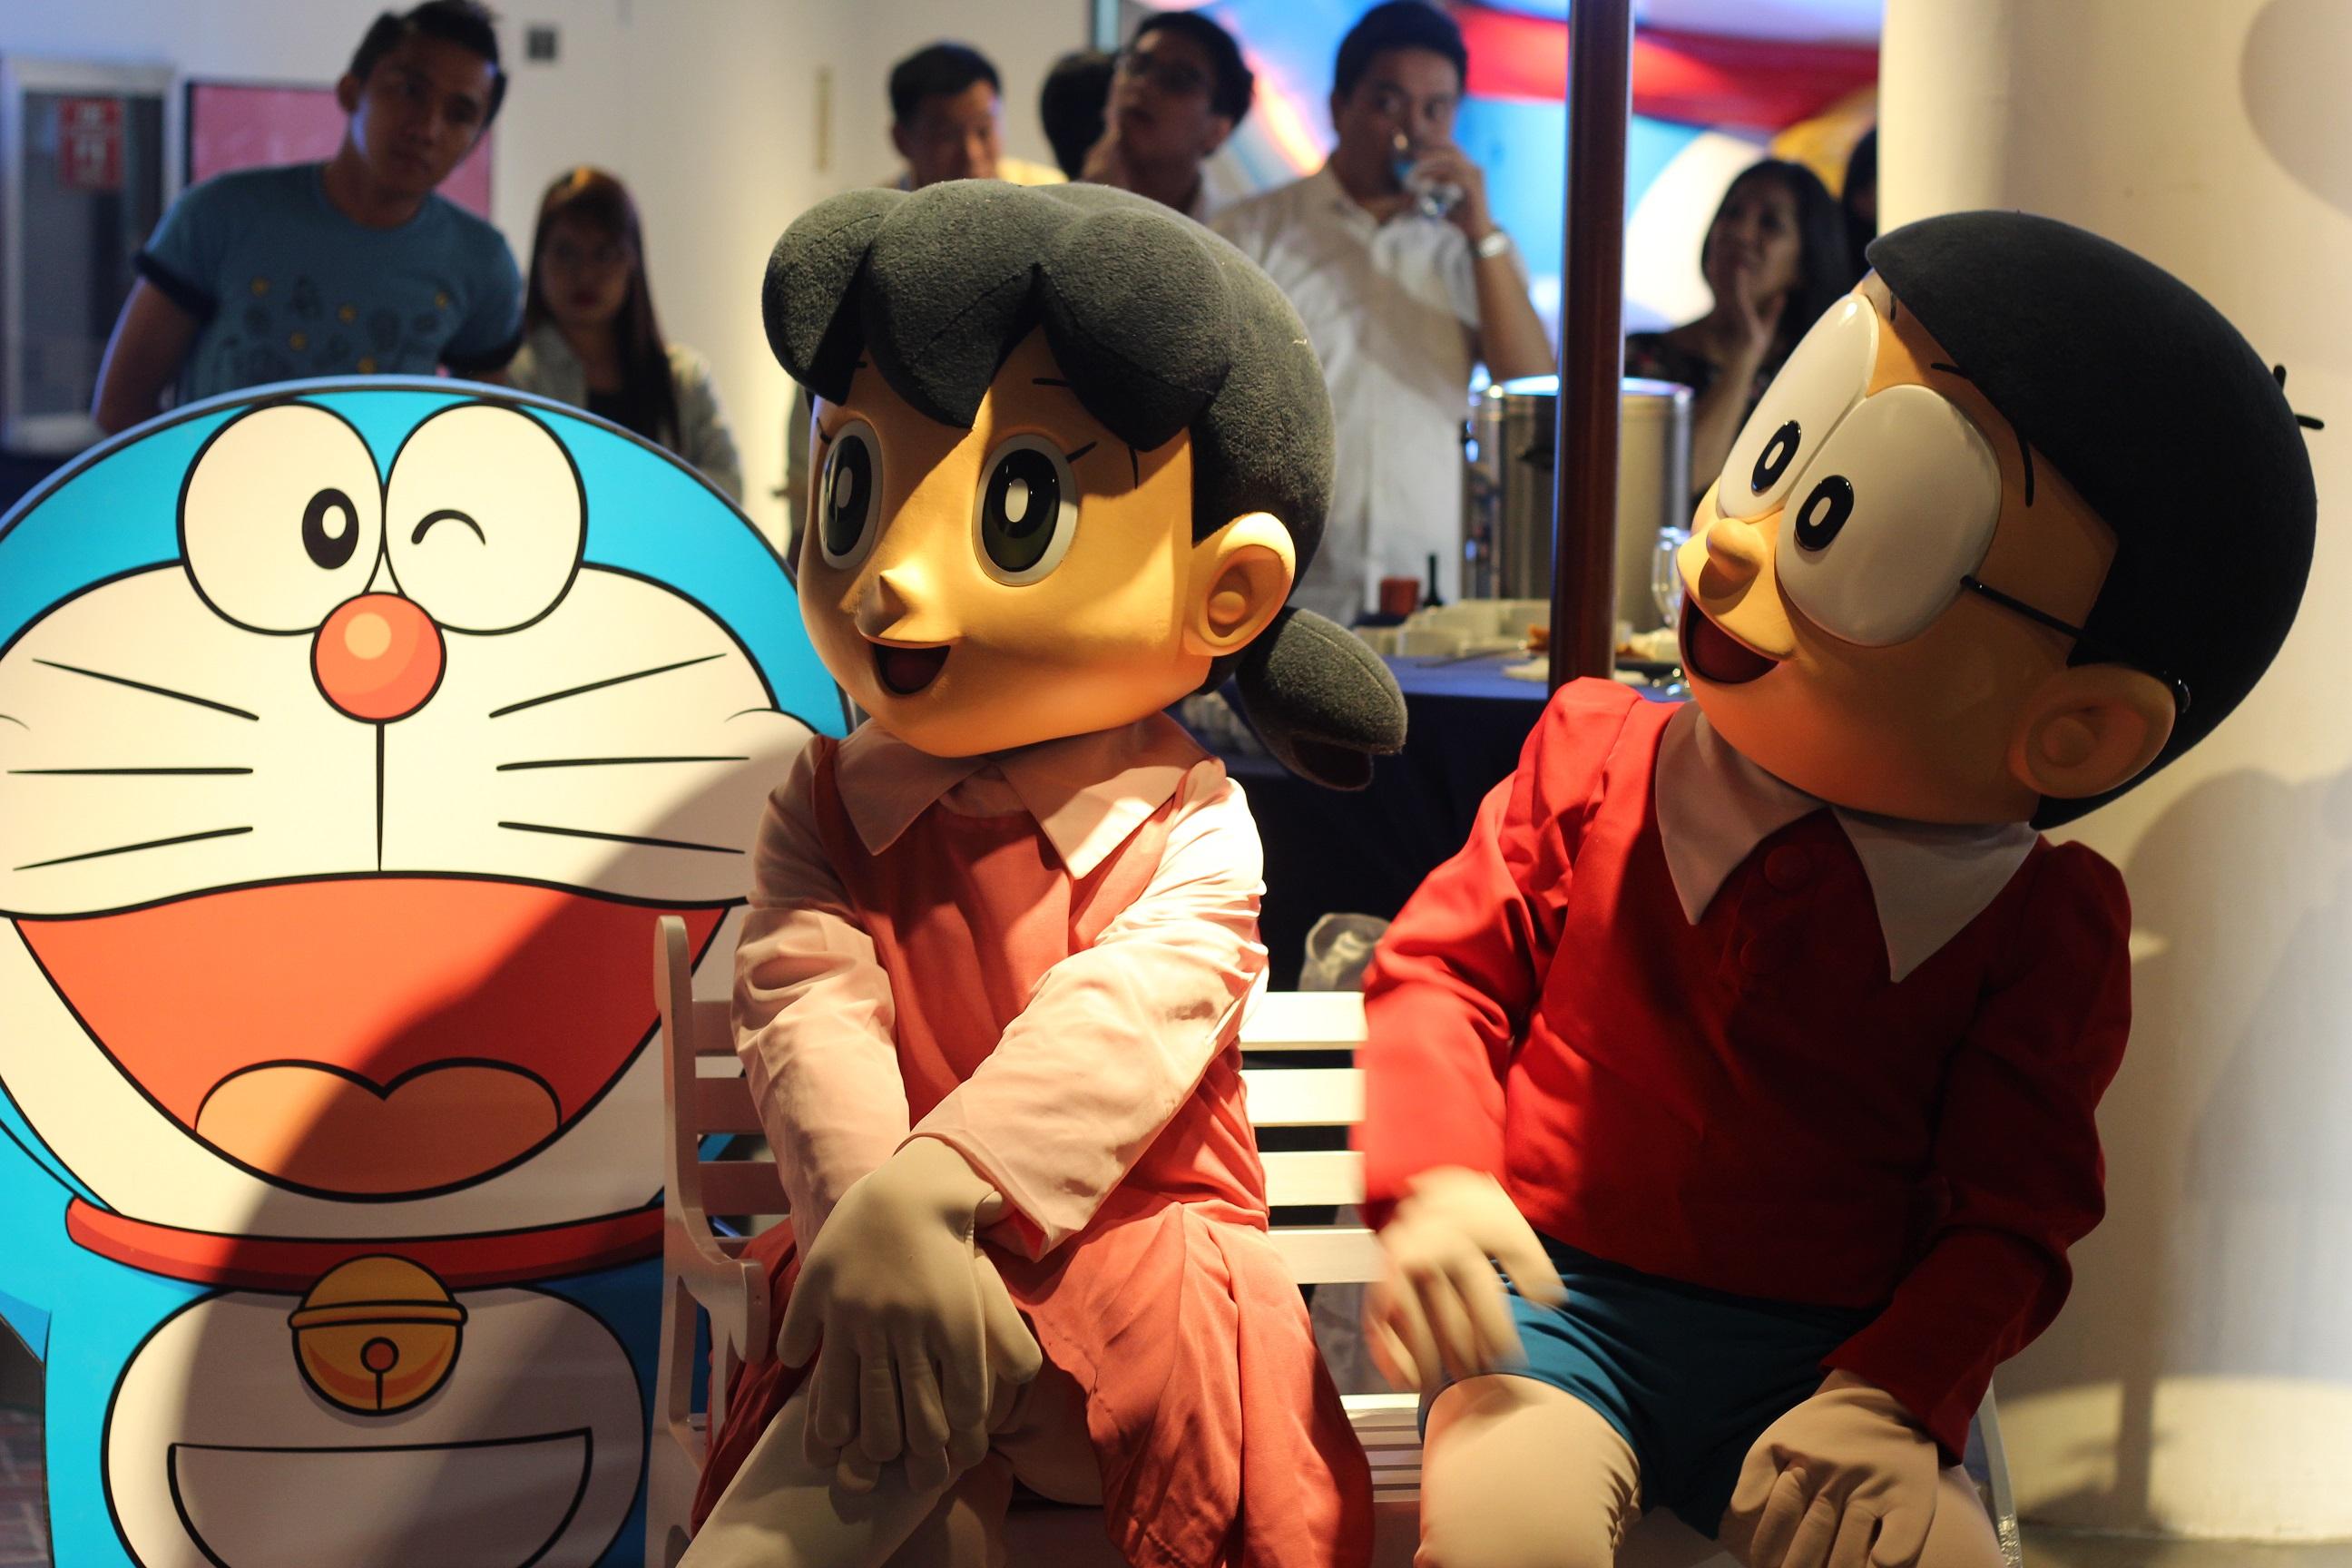 It's 2017 and we definitely have not forgotten Doraemon